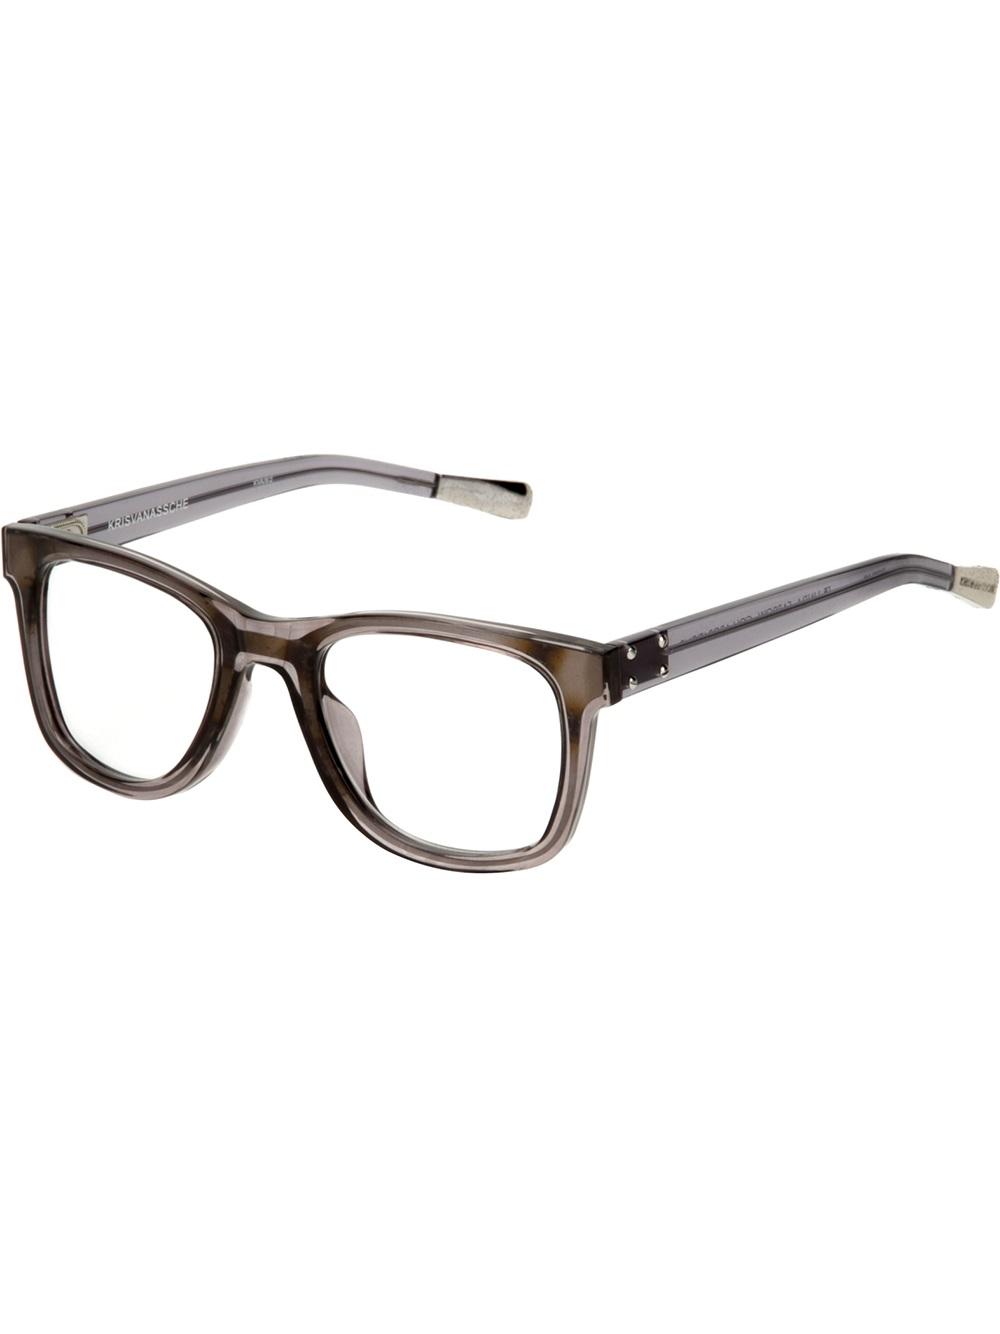 Vans Glasses Frame : Kris van assche Square Frame Glasses in for Men (grey) Lyst